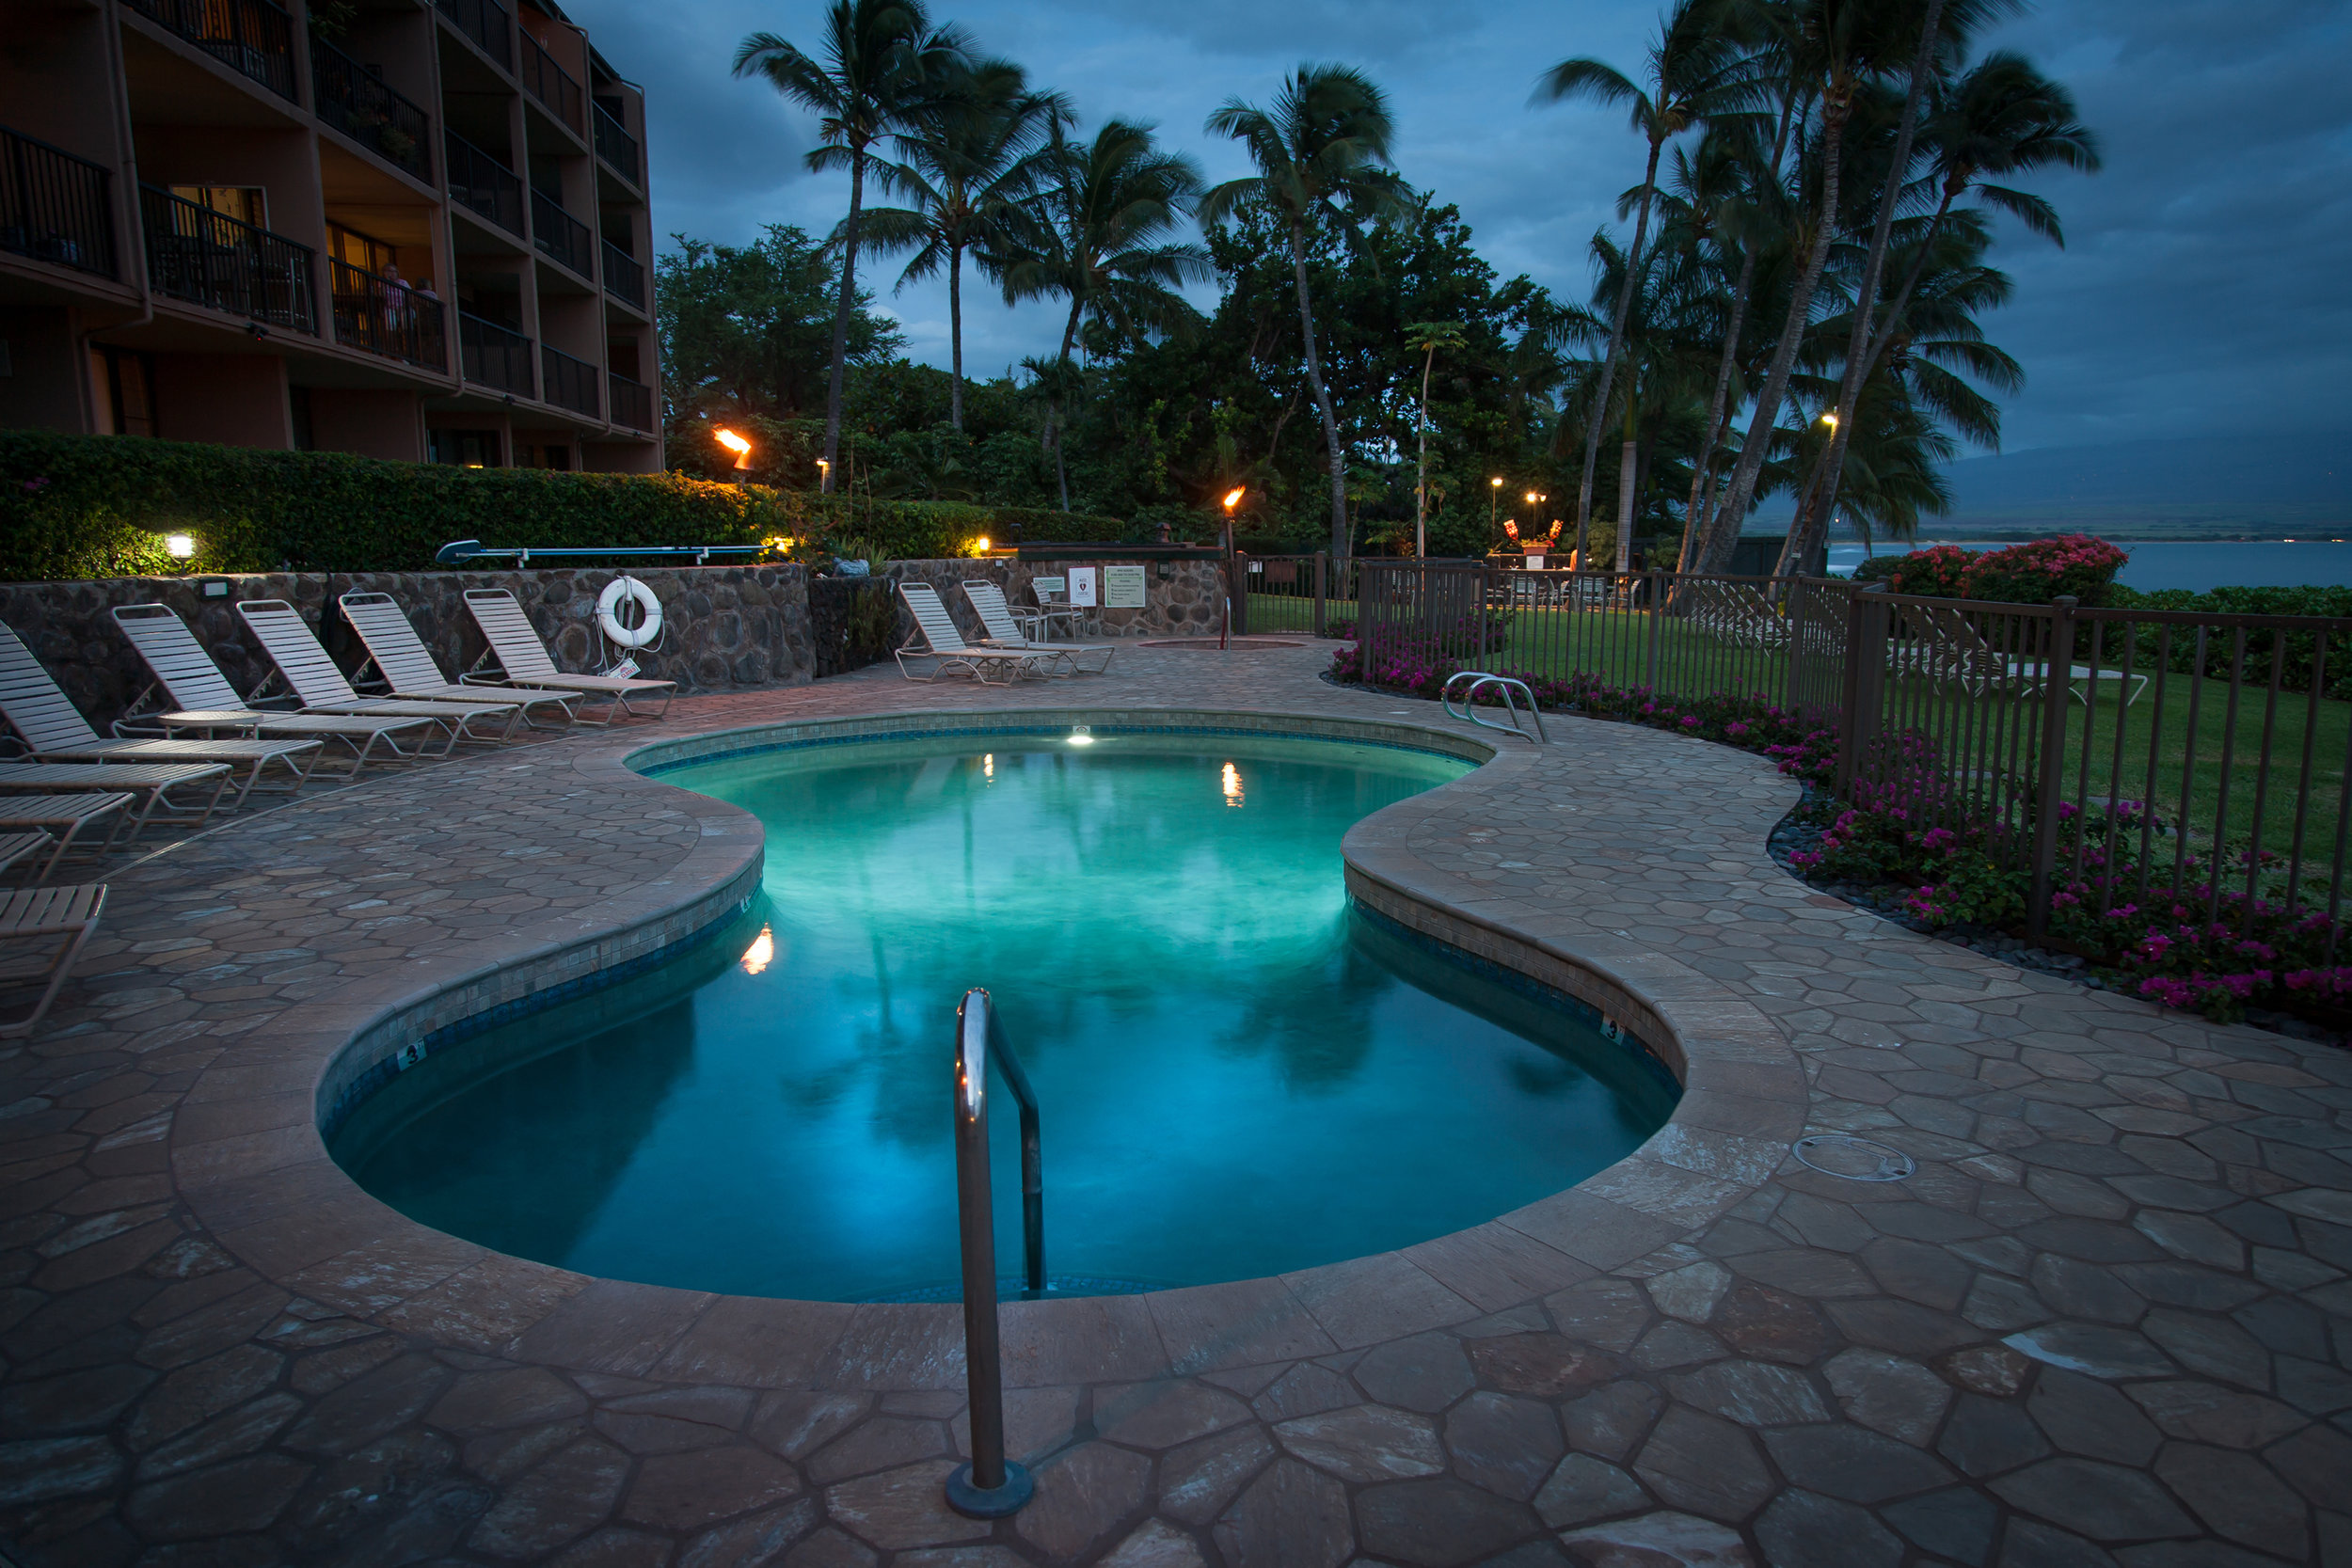 Maalaea-Banyans-Condo-Rentals-Maui-P2c.jpg